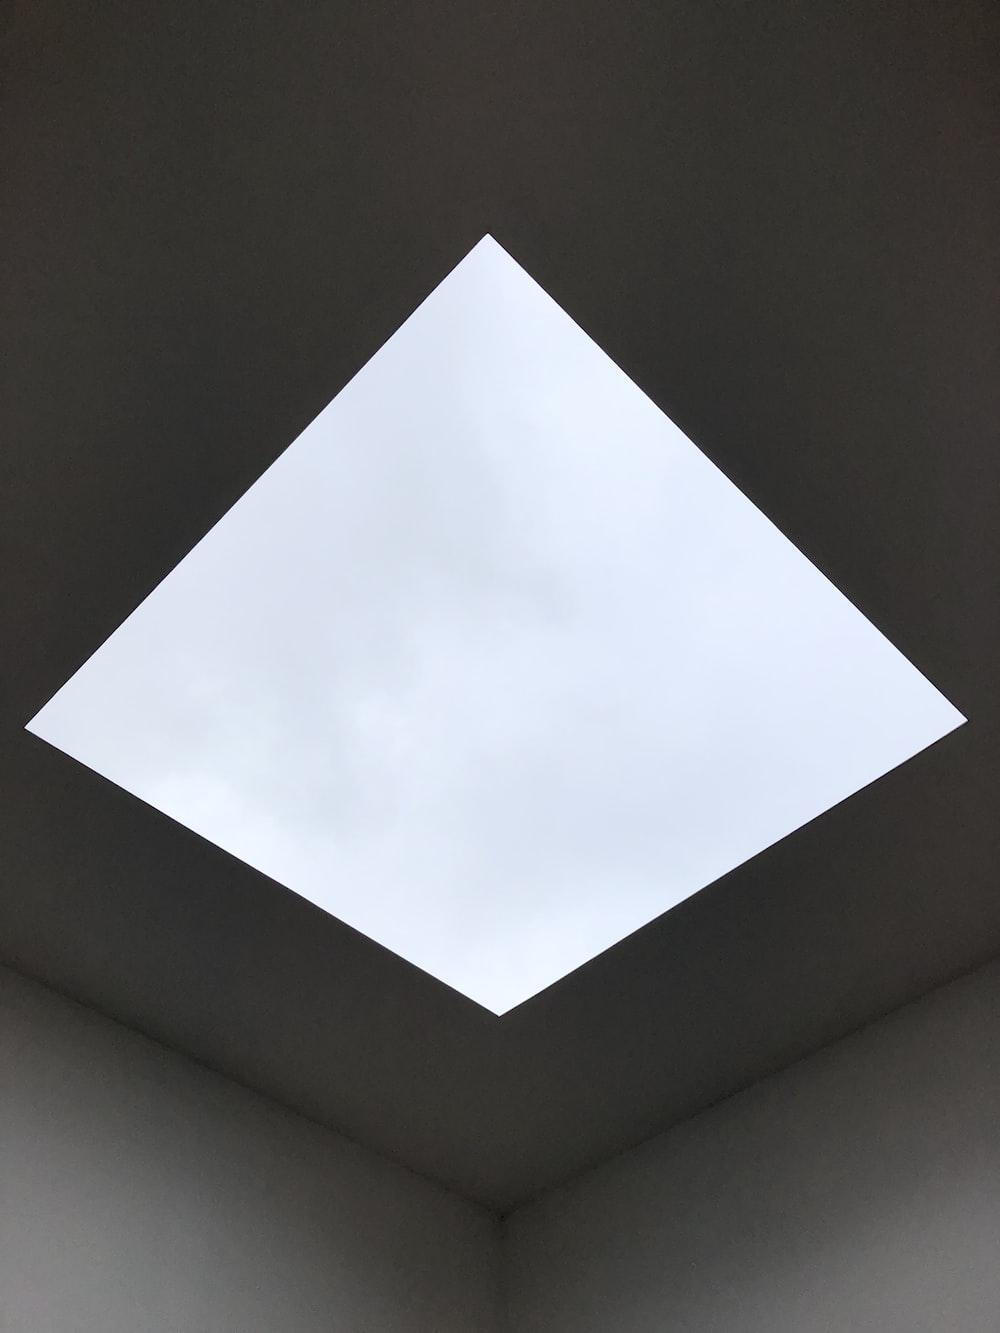 square white ceiling